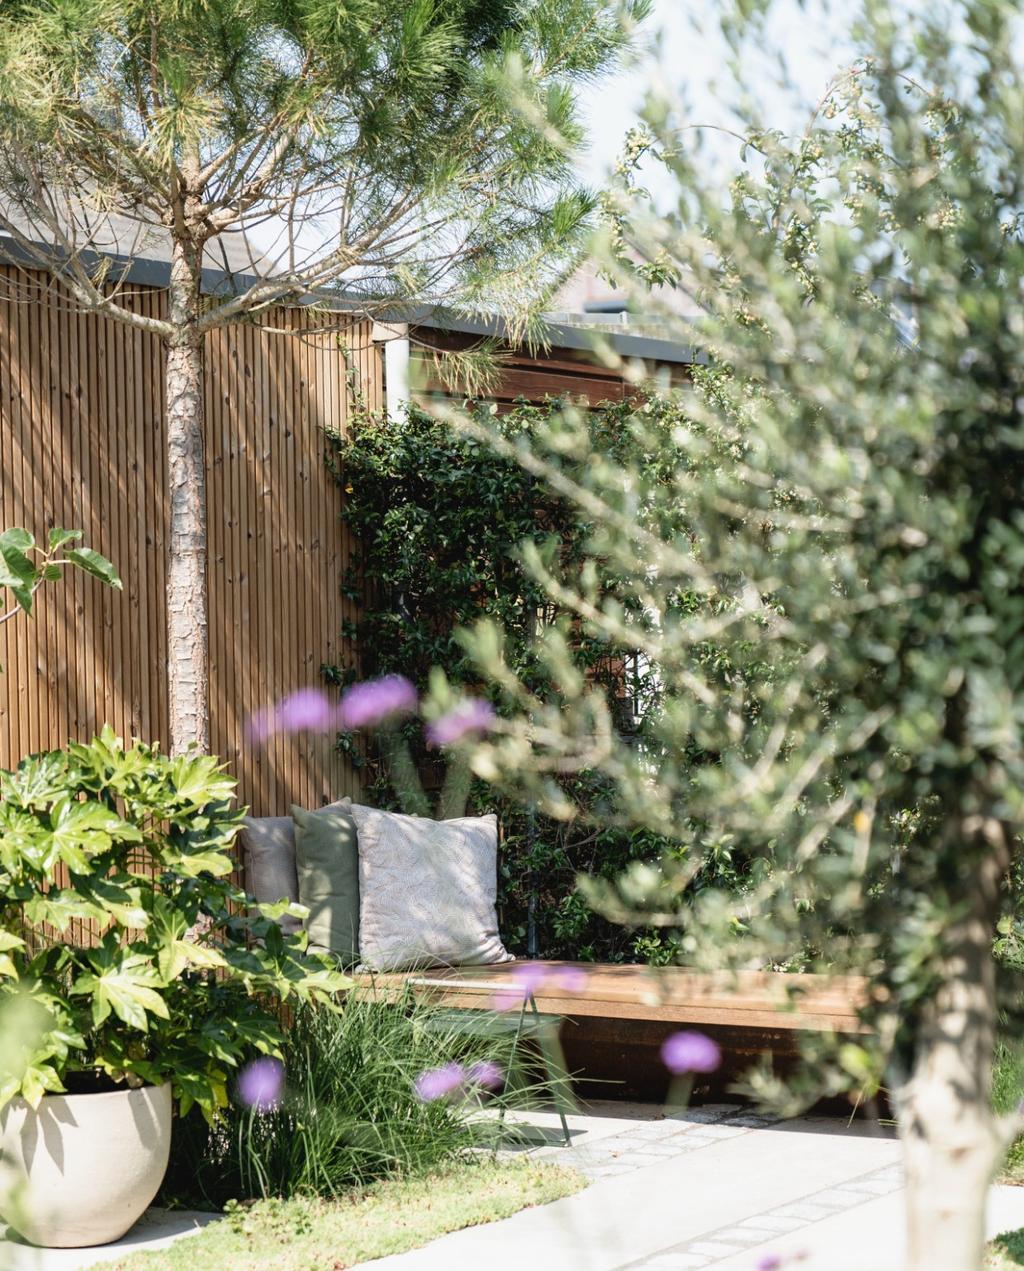 tuin | terras | zomer | tuinieren | tuinbank | tuinafscheiding hout | tuinplanten